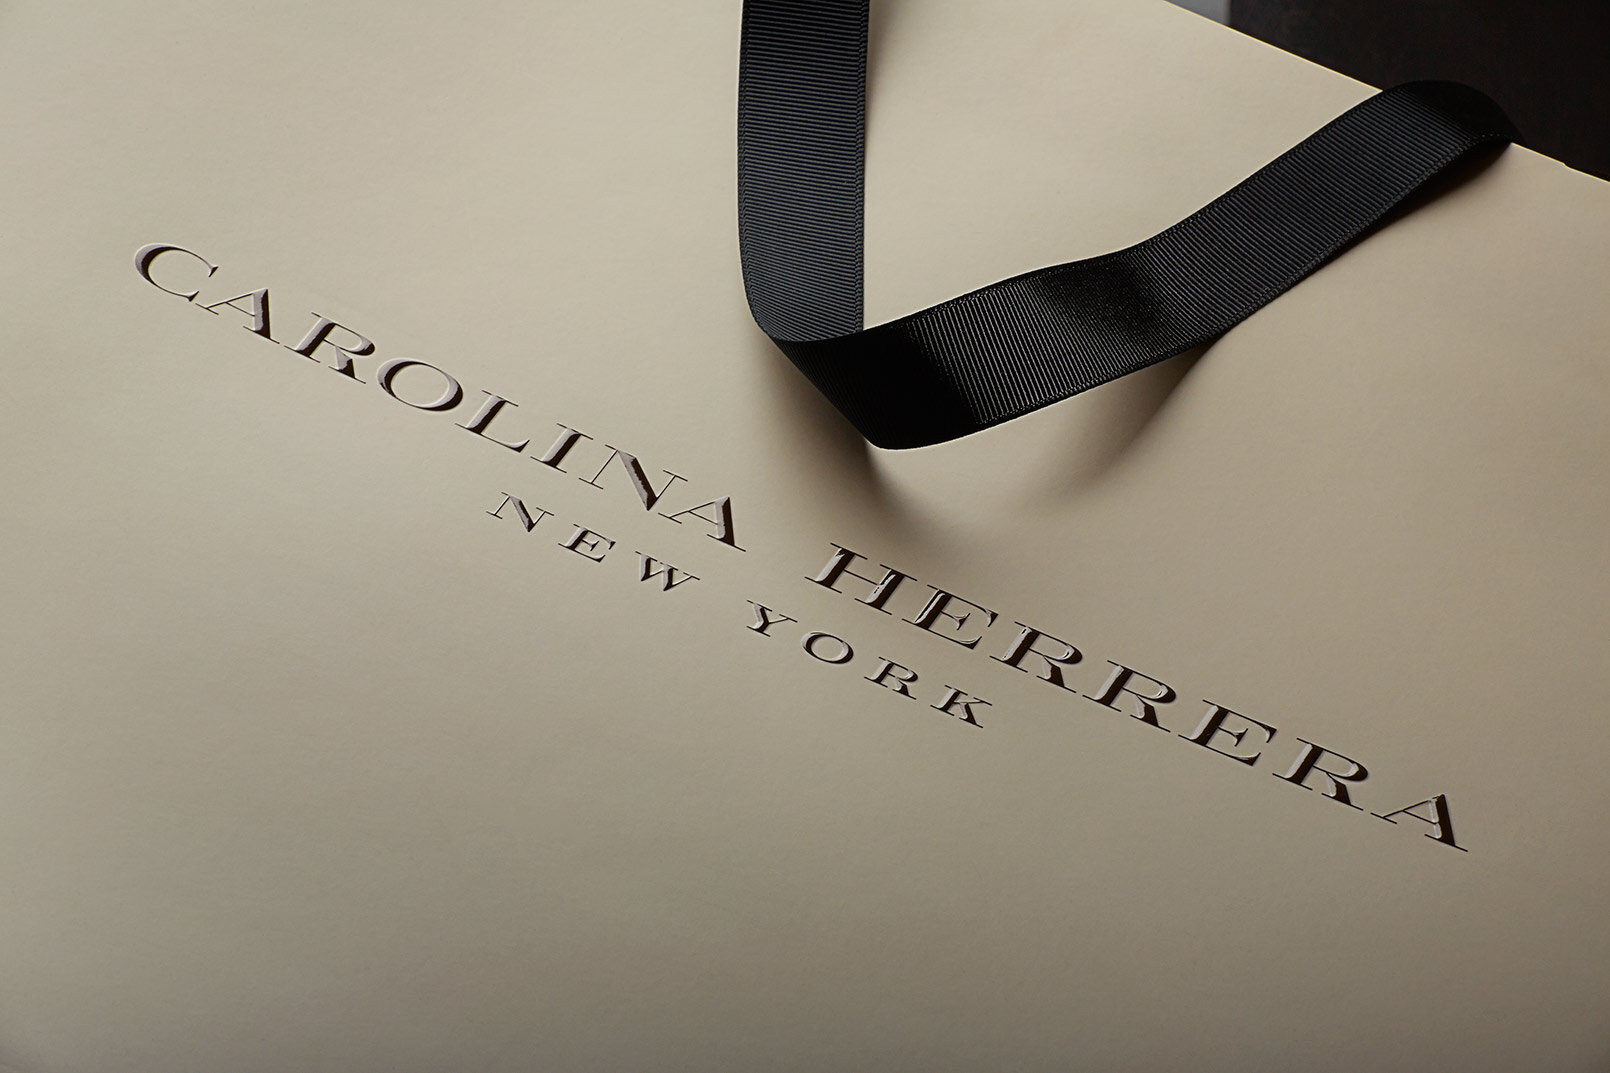 Carolina-Hererra-Shopping-Bag-Design-Packaging Company-2.JPG